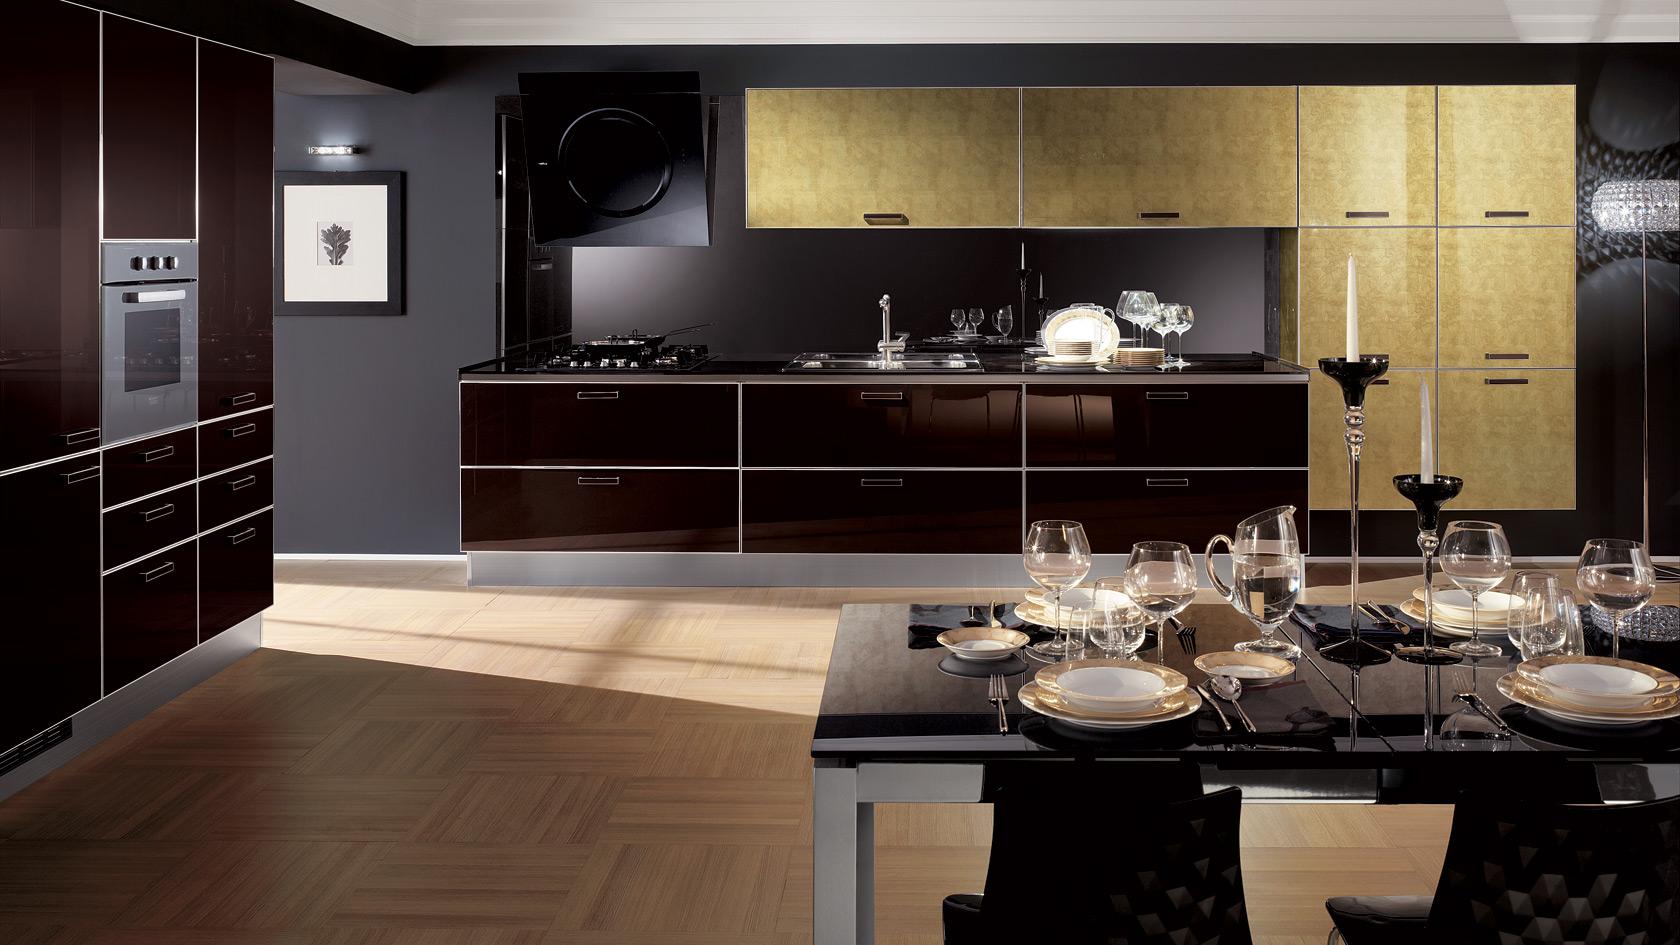 Tavoli Da Cucina Scavolini : Cucina scavolini crystal arredamenti modena 4 arredamenti casarini